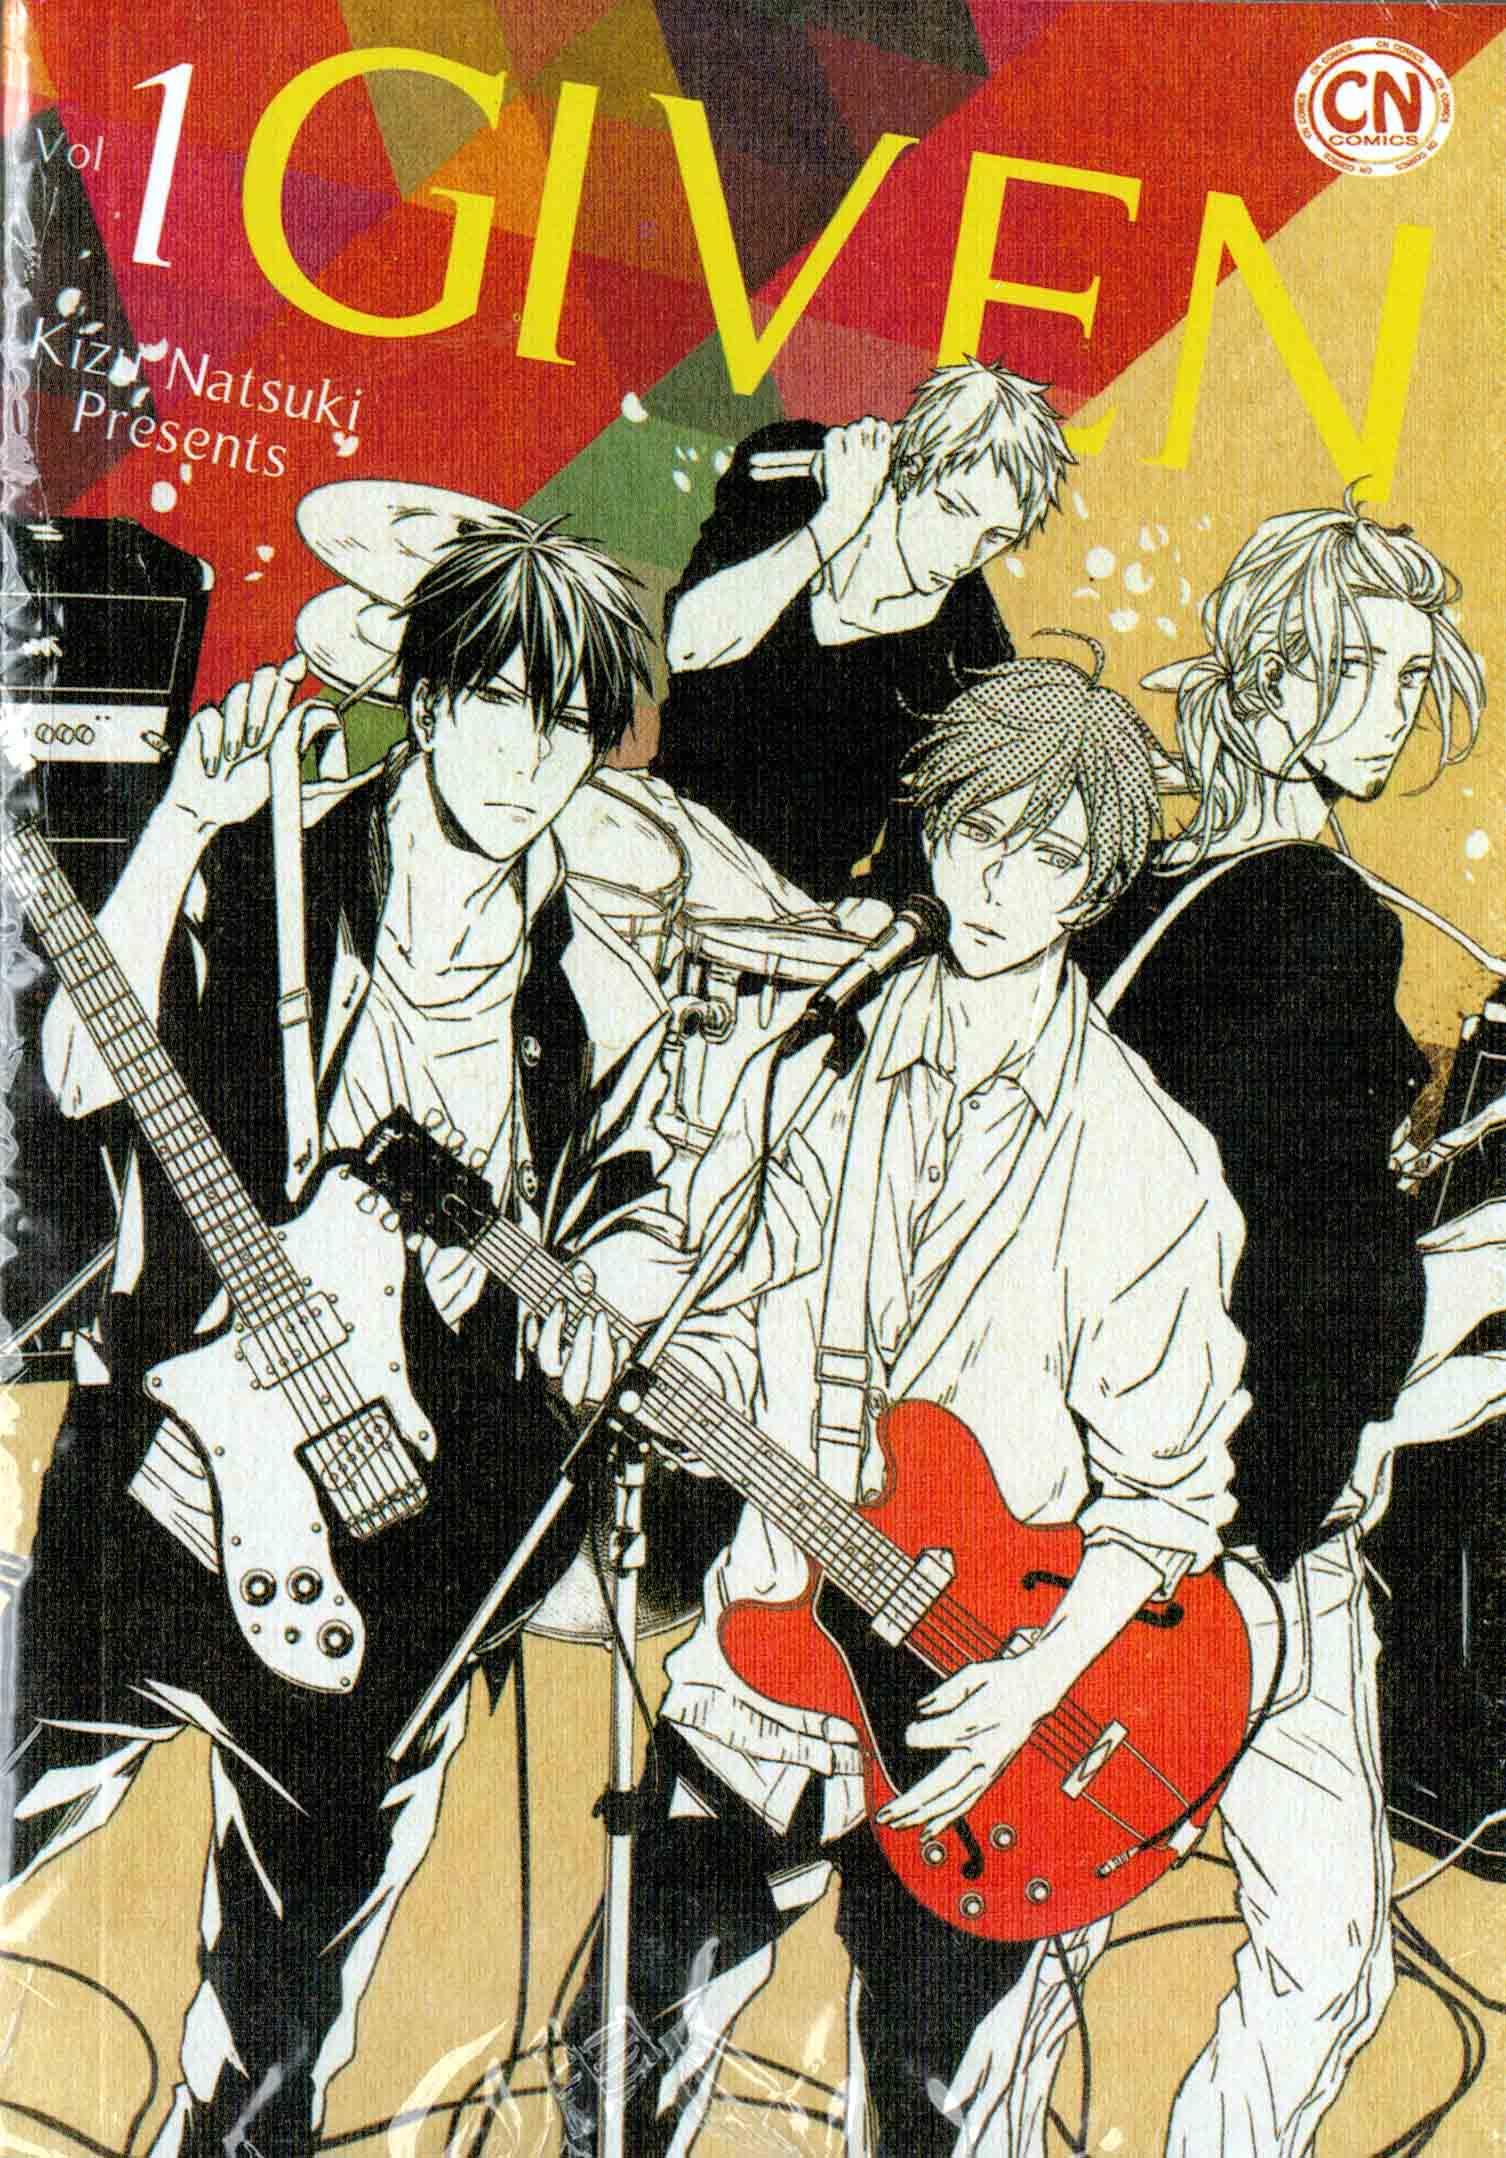 GIVEN เล่ม 01 : Kizu Natsuki - ลายเส้นสวยมาก